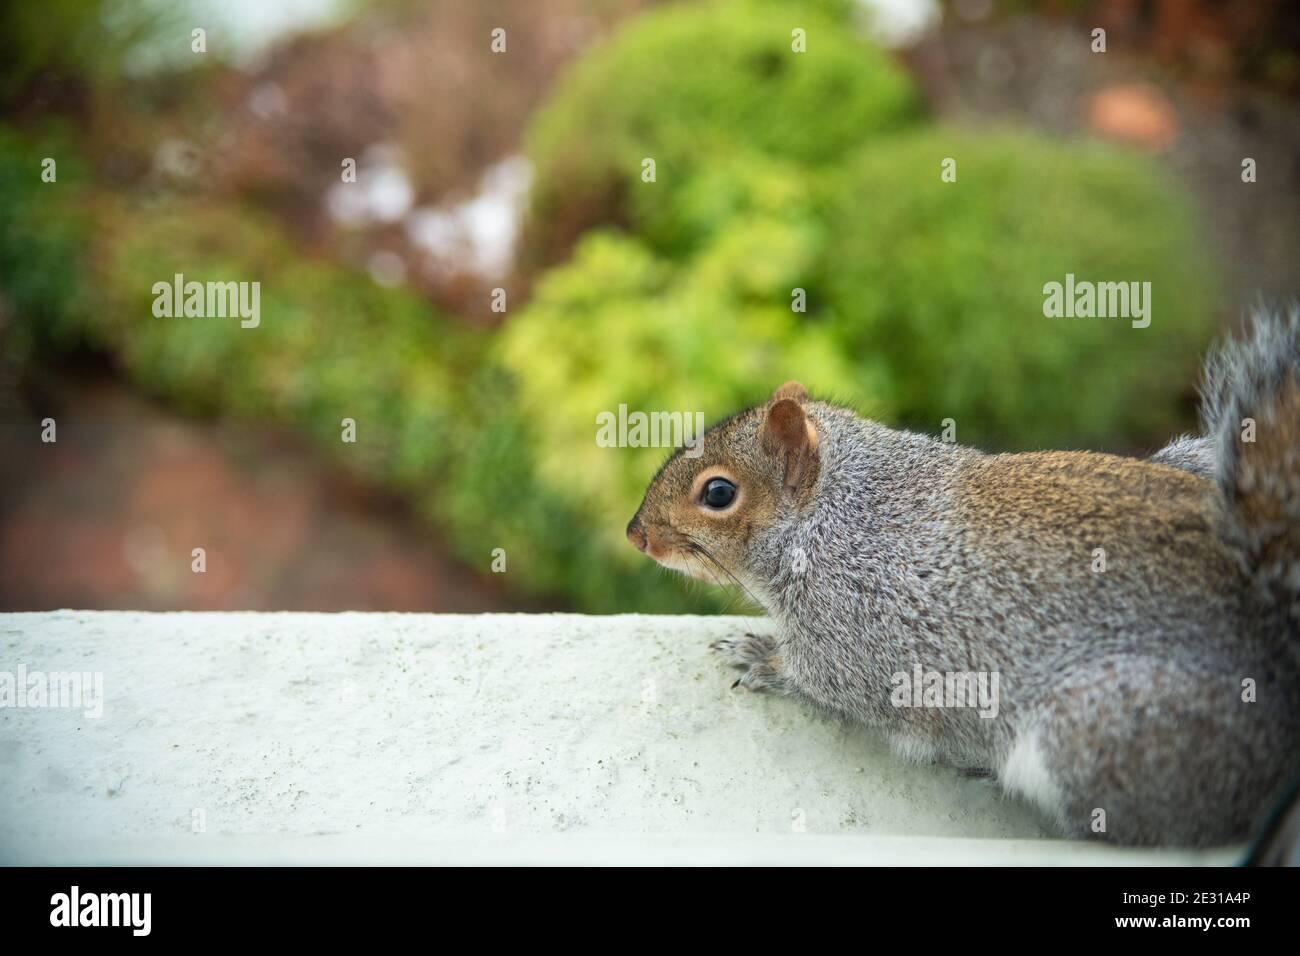 Grey Squirrel (Sciurus carolinensis) sitting on upstairs exterior windowsill looking down over garden (photograph taken from inside) - Scotland, UK Stock Photo